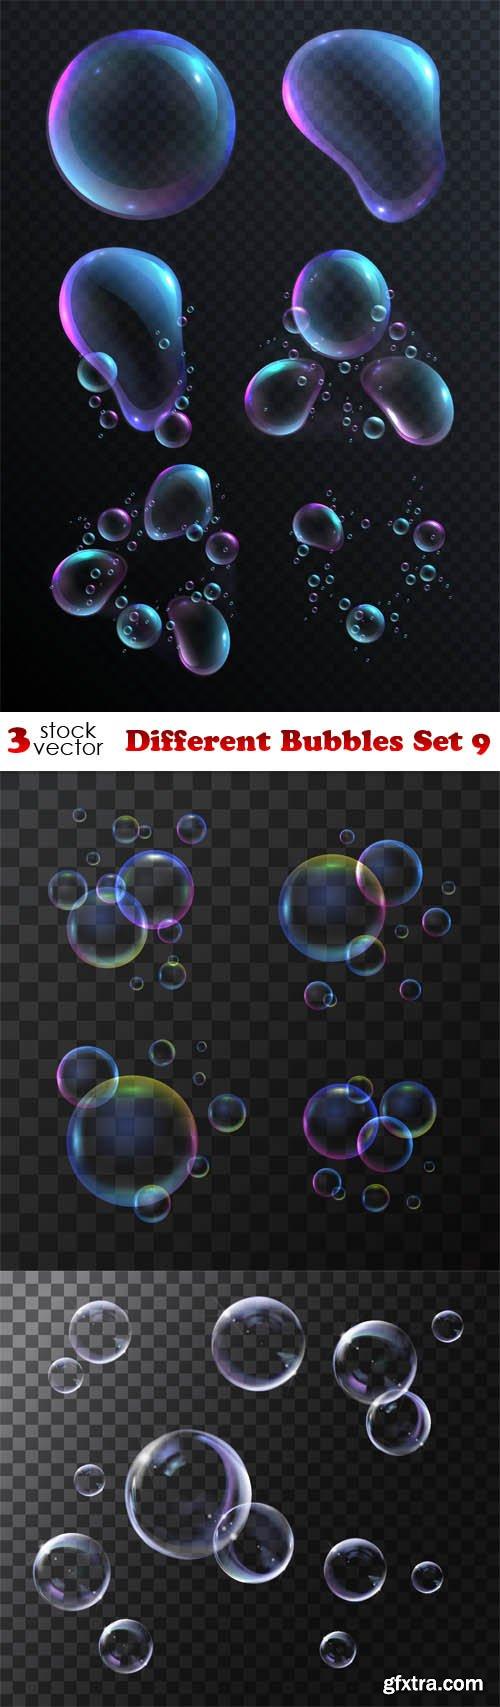 Vectors - Different Bubbles Set 9